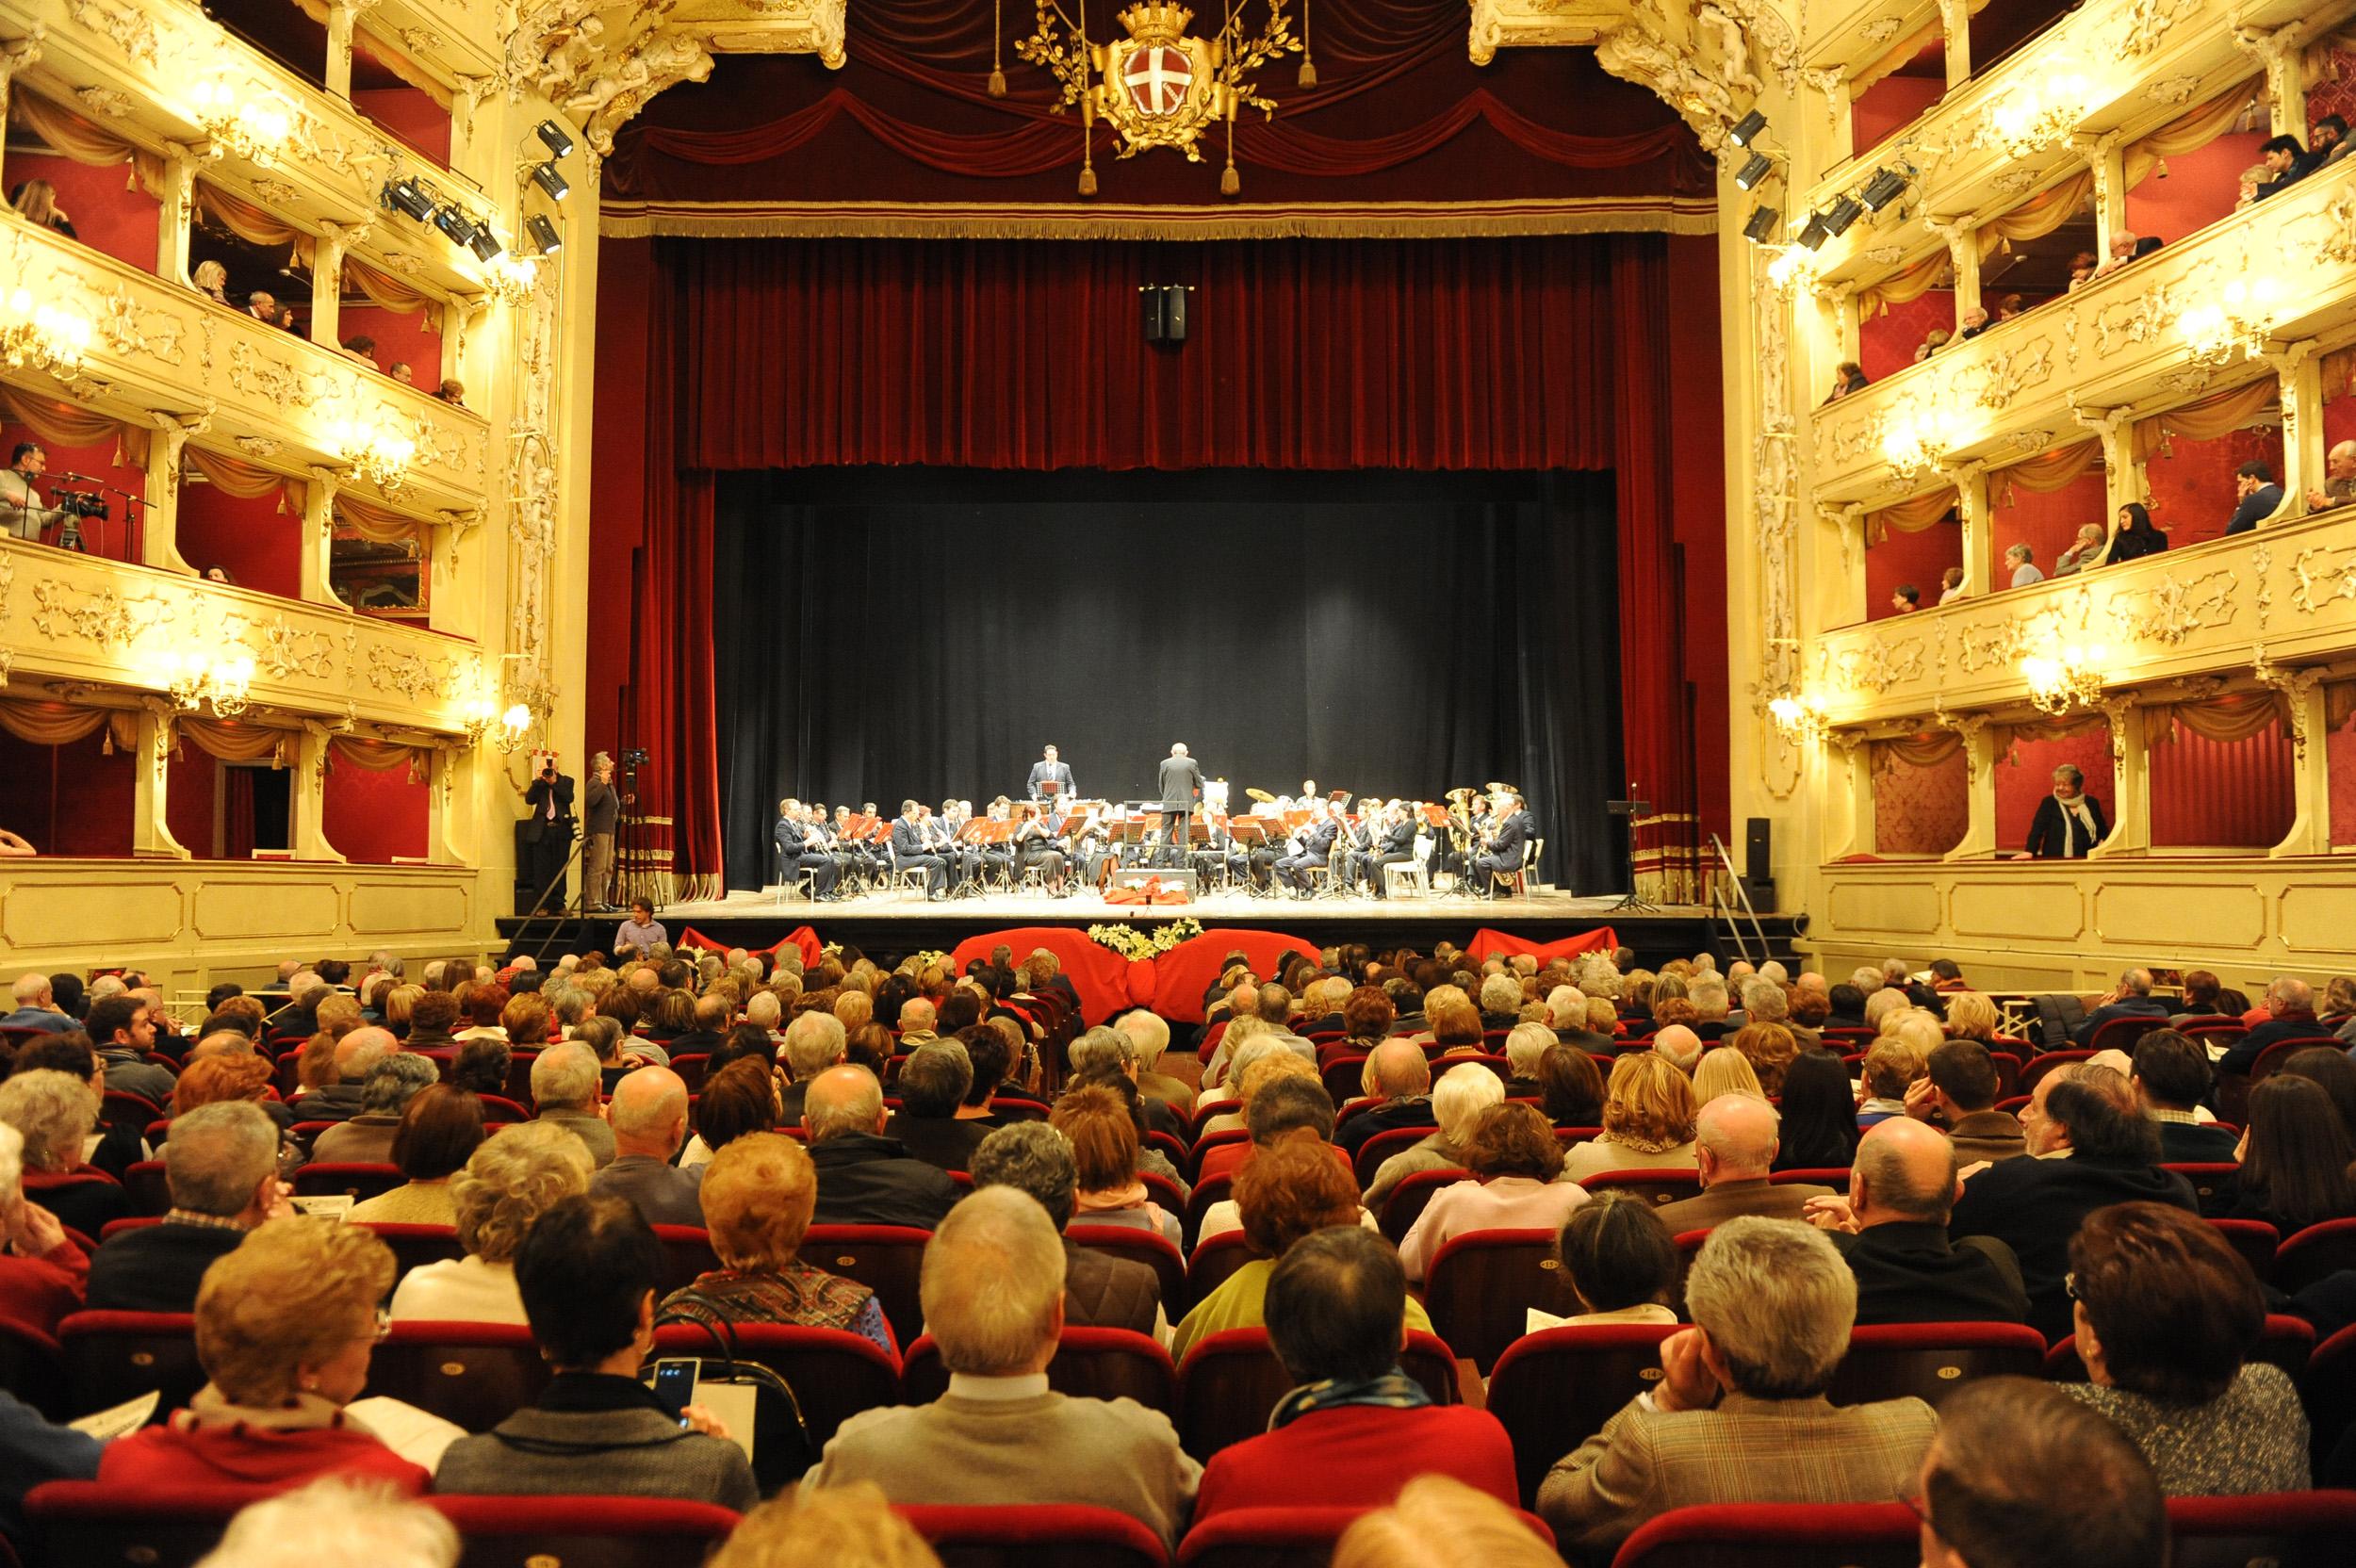 http://www.espansionetv.it/wp-content/uploads/2015/01/2015_01_02_famiglia_comasca_concerto.jpg